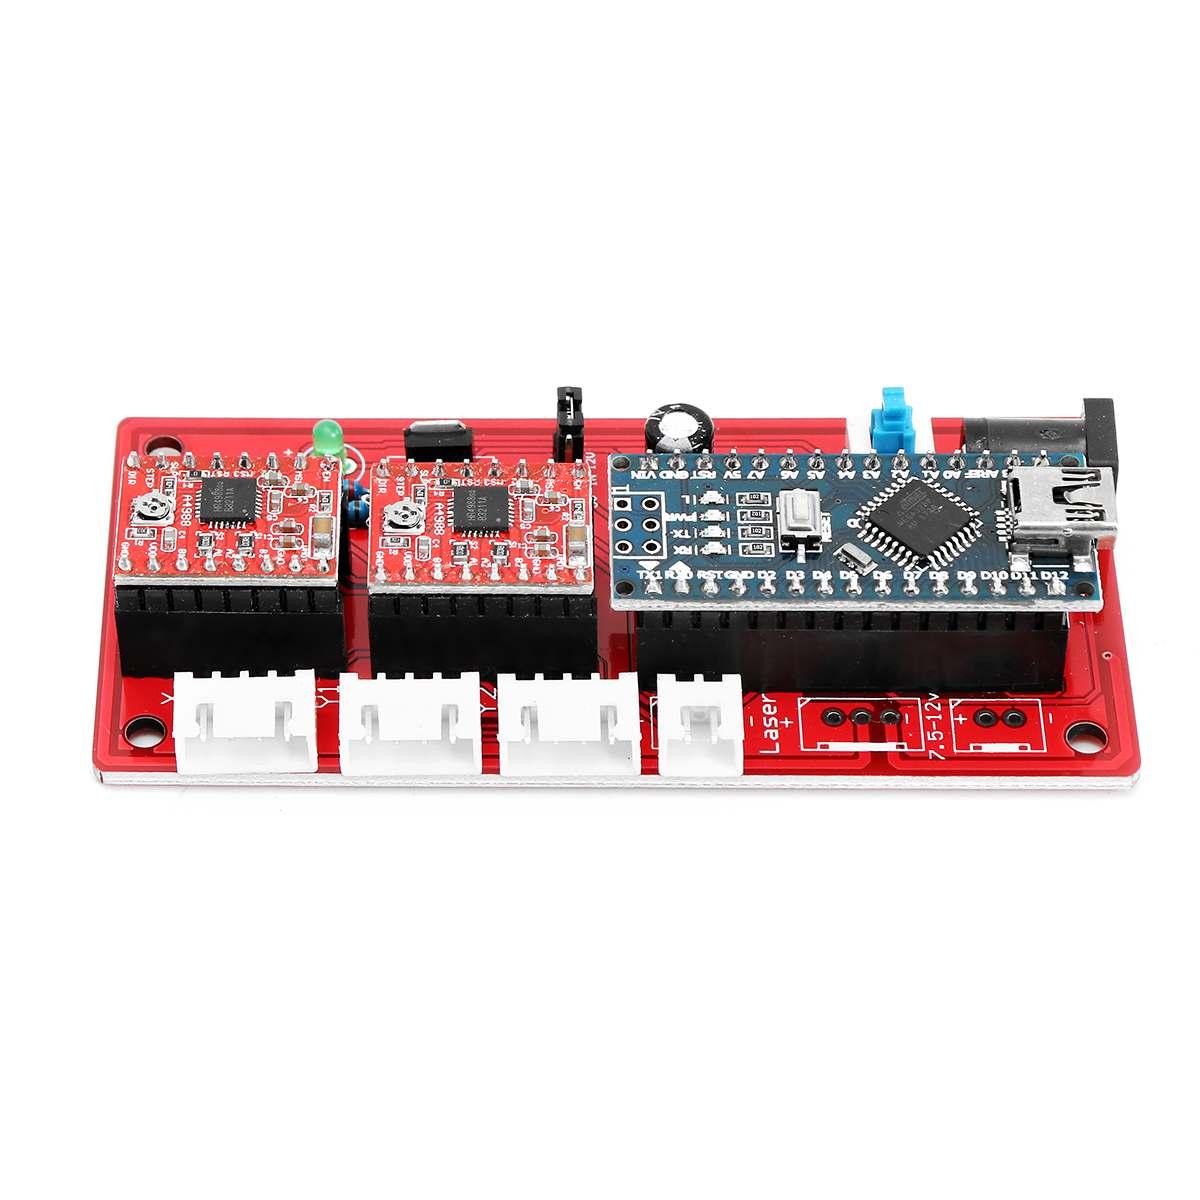 USB 2 Axis Control Board Laser Driver DIY Laser Engraving Machine Motherboard Support For Adjustable Laser Module Output